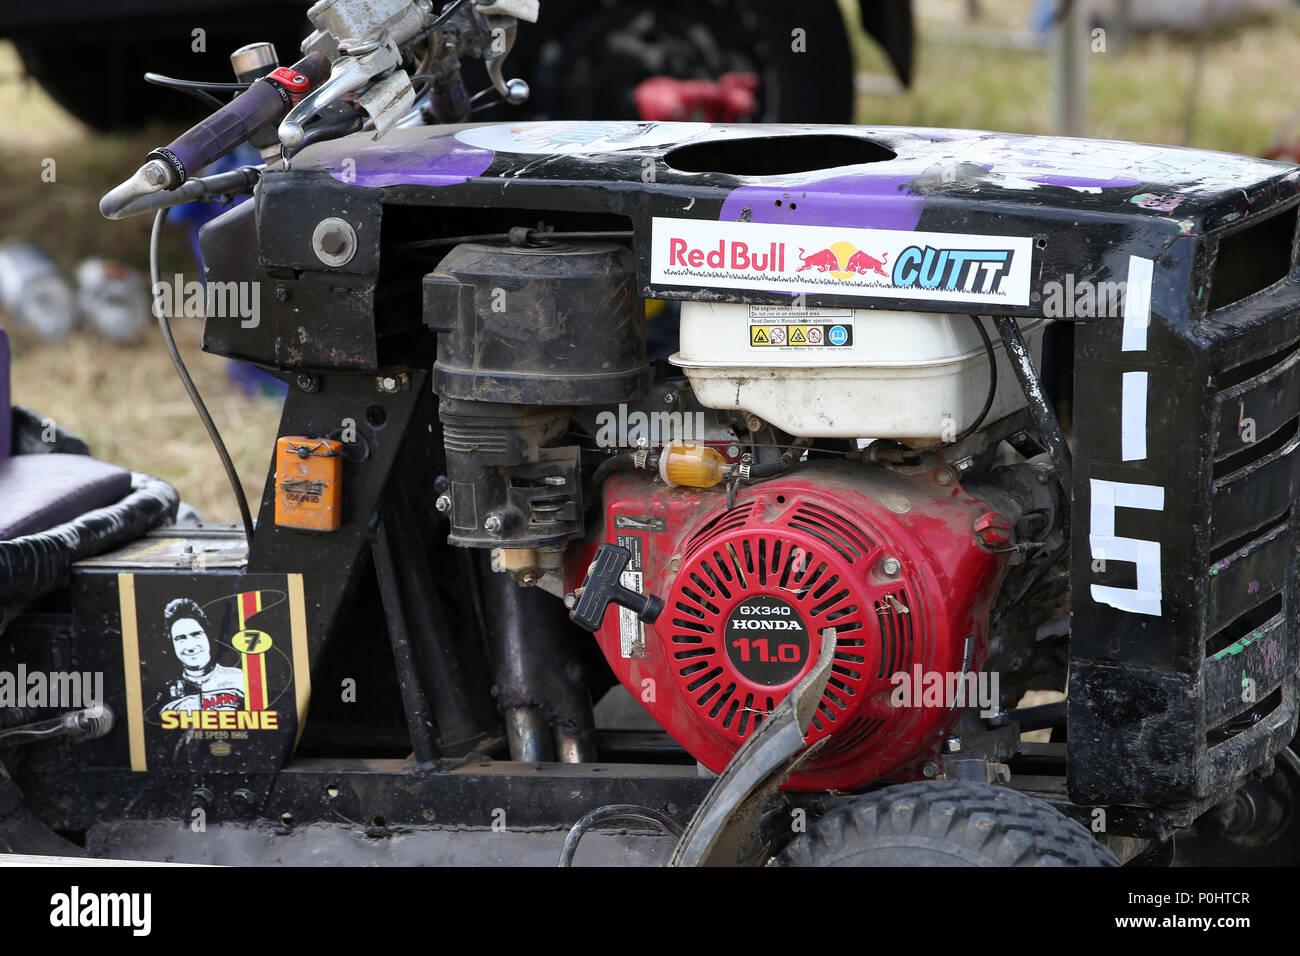 Somerset Uk 9 June 2018 Red Bull Cut It Lawn Mower Racing Event In Axbridge Somerset